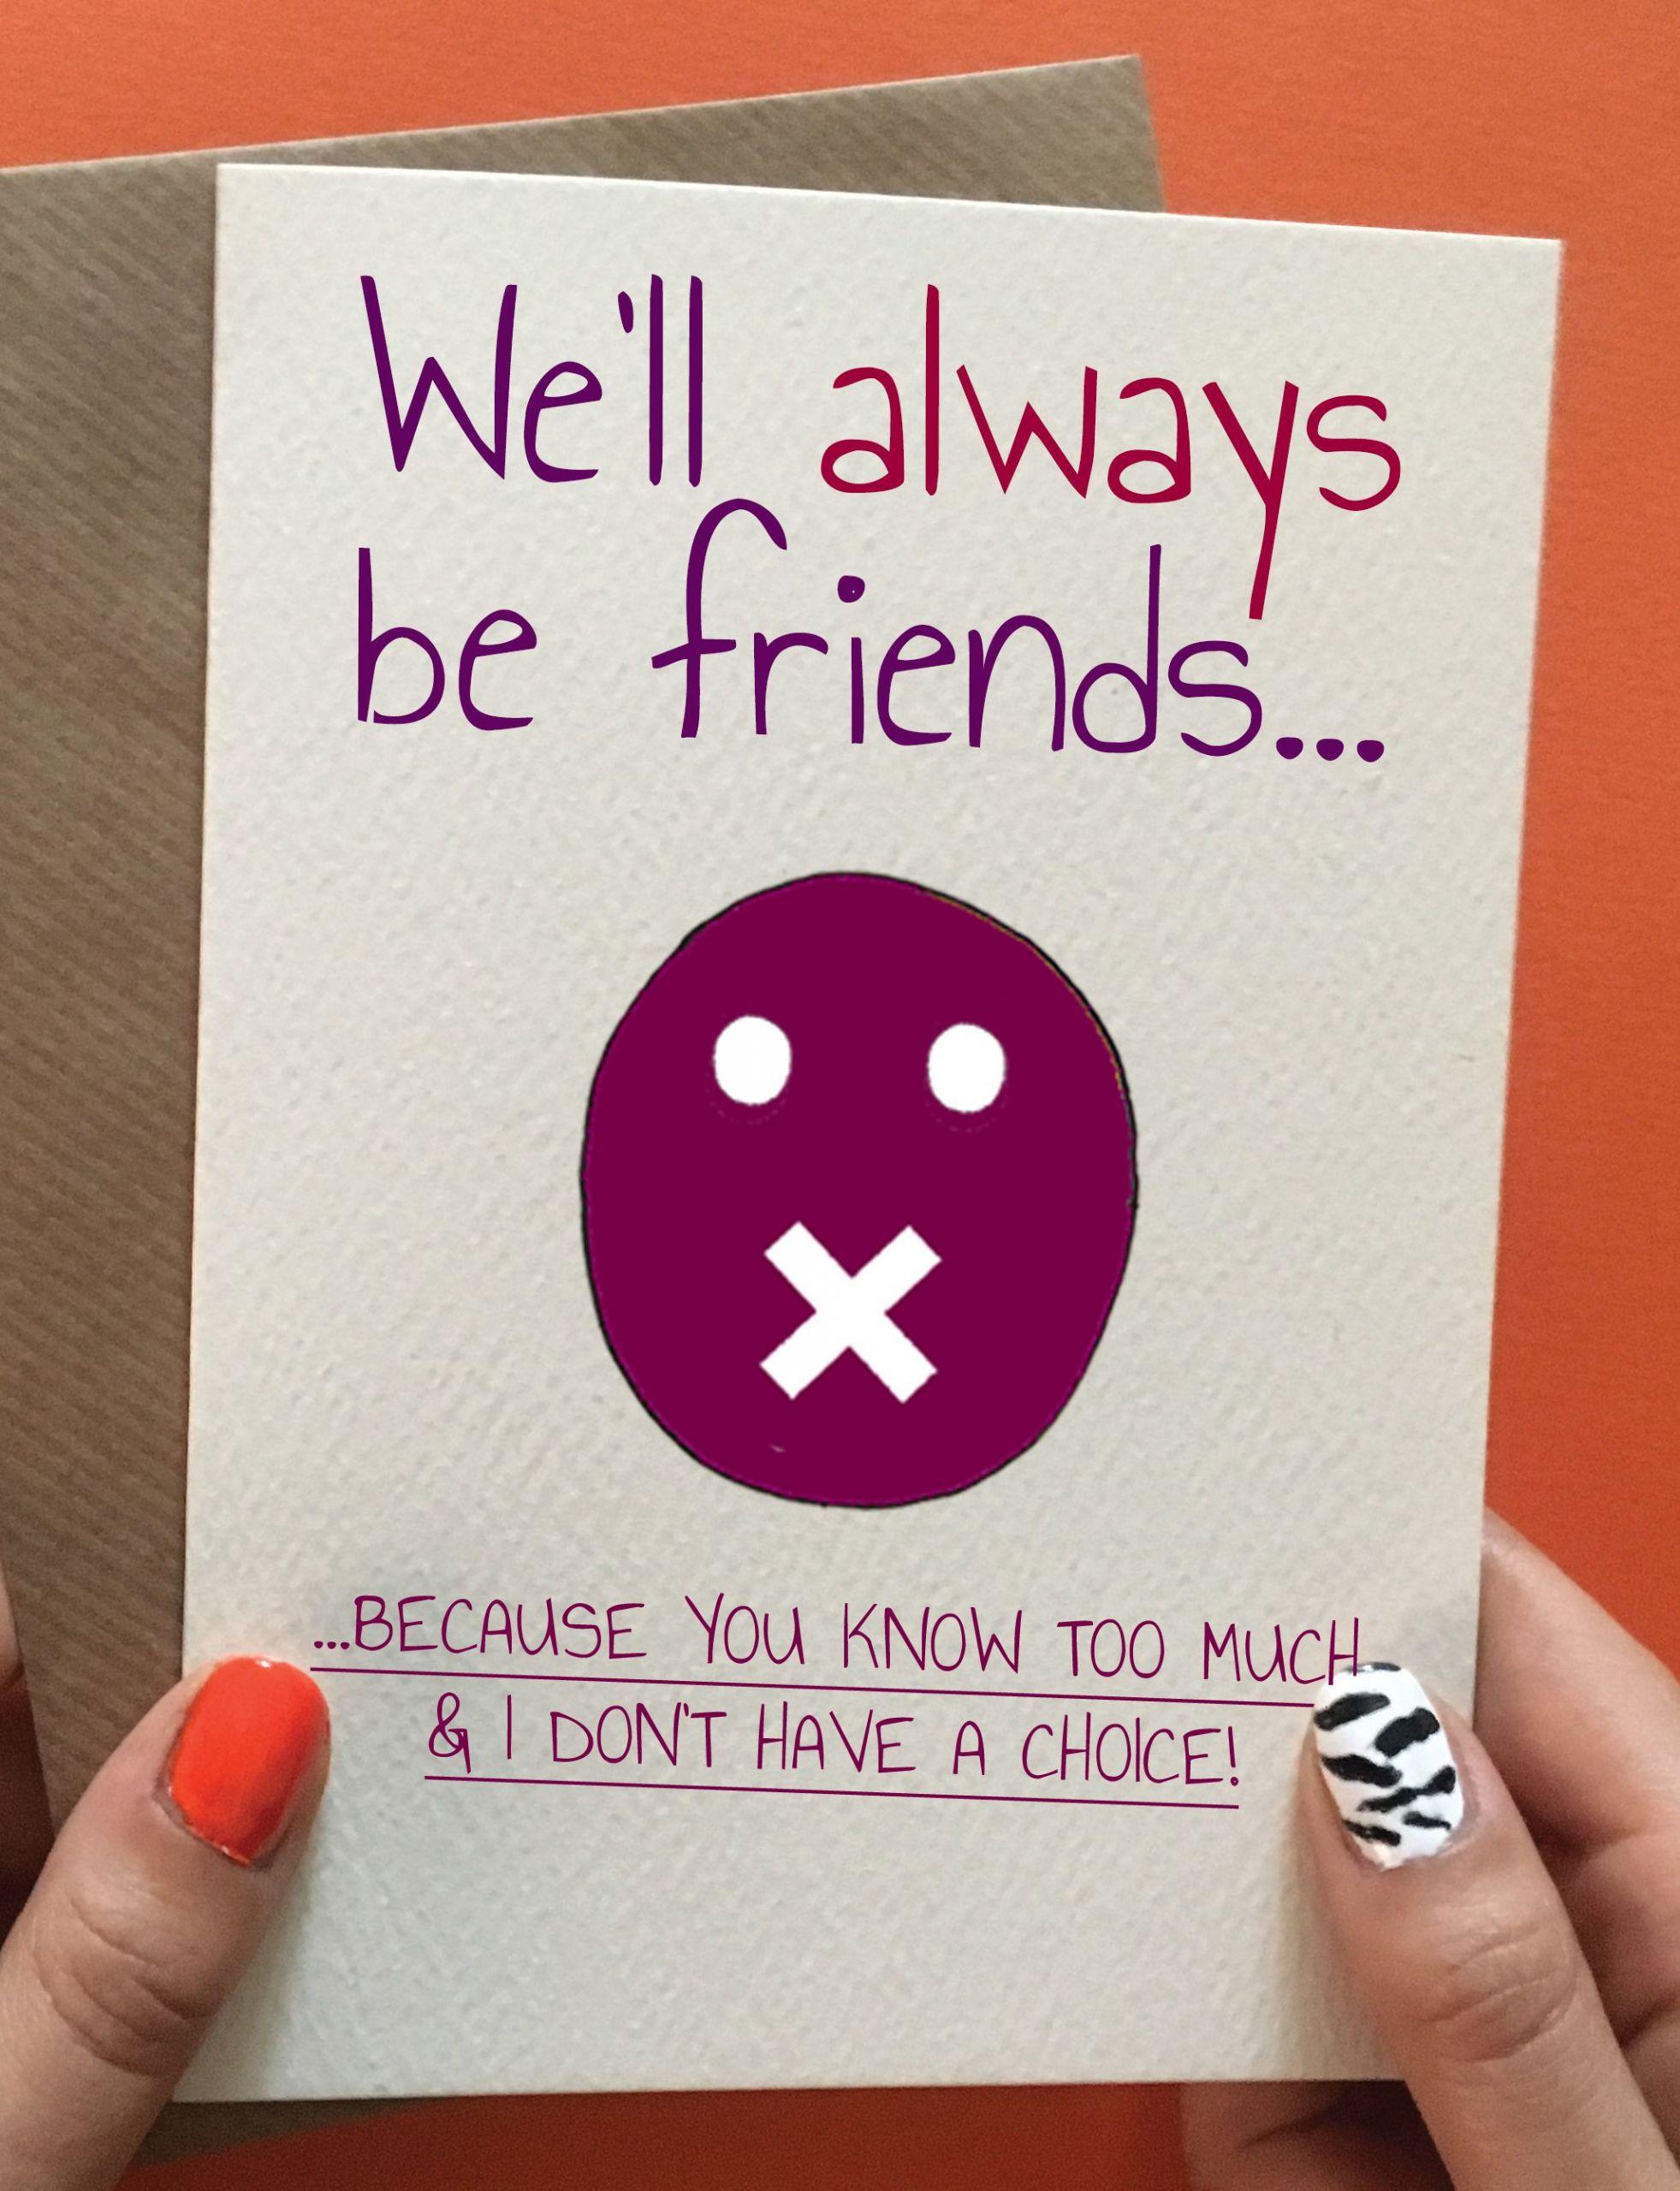 Funny Homemade Birthday Card Ideas  We ll Always Be Friends